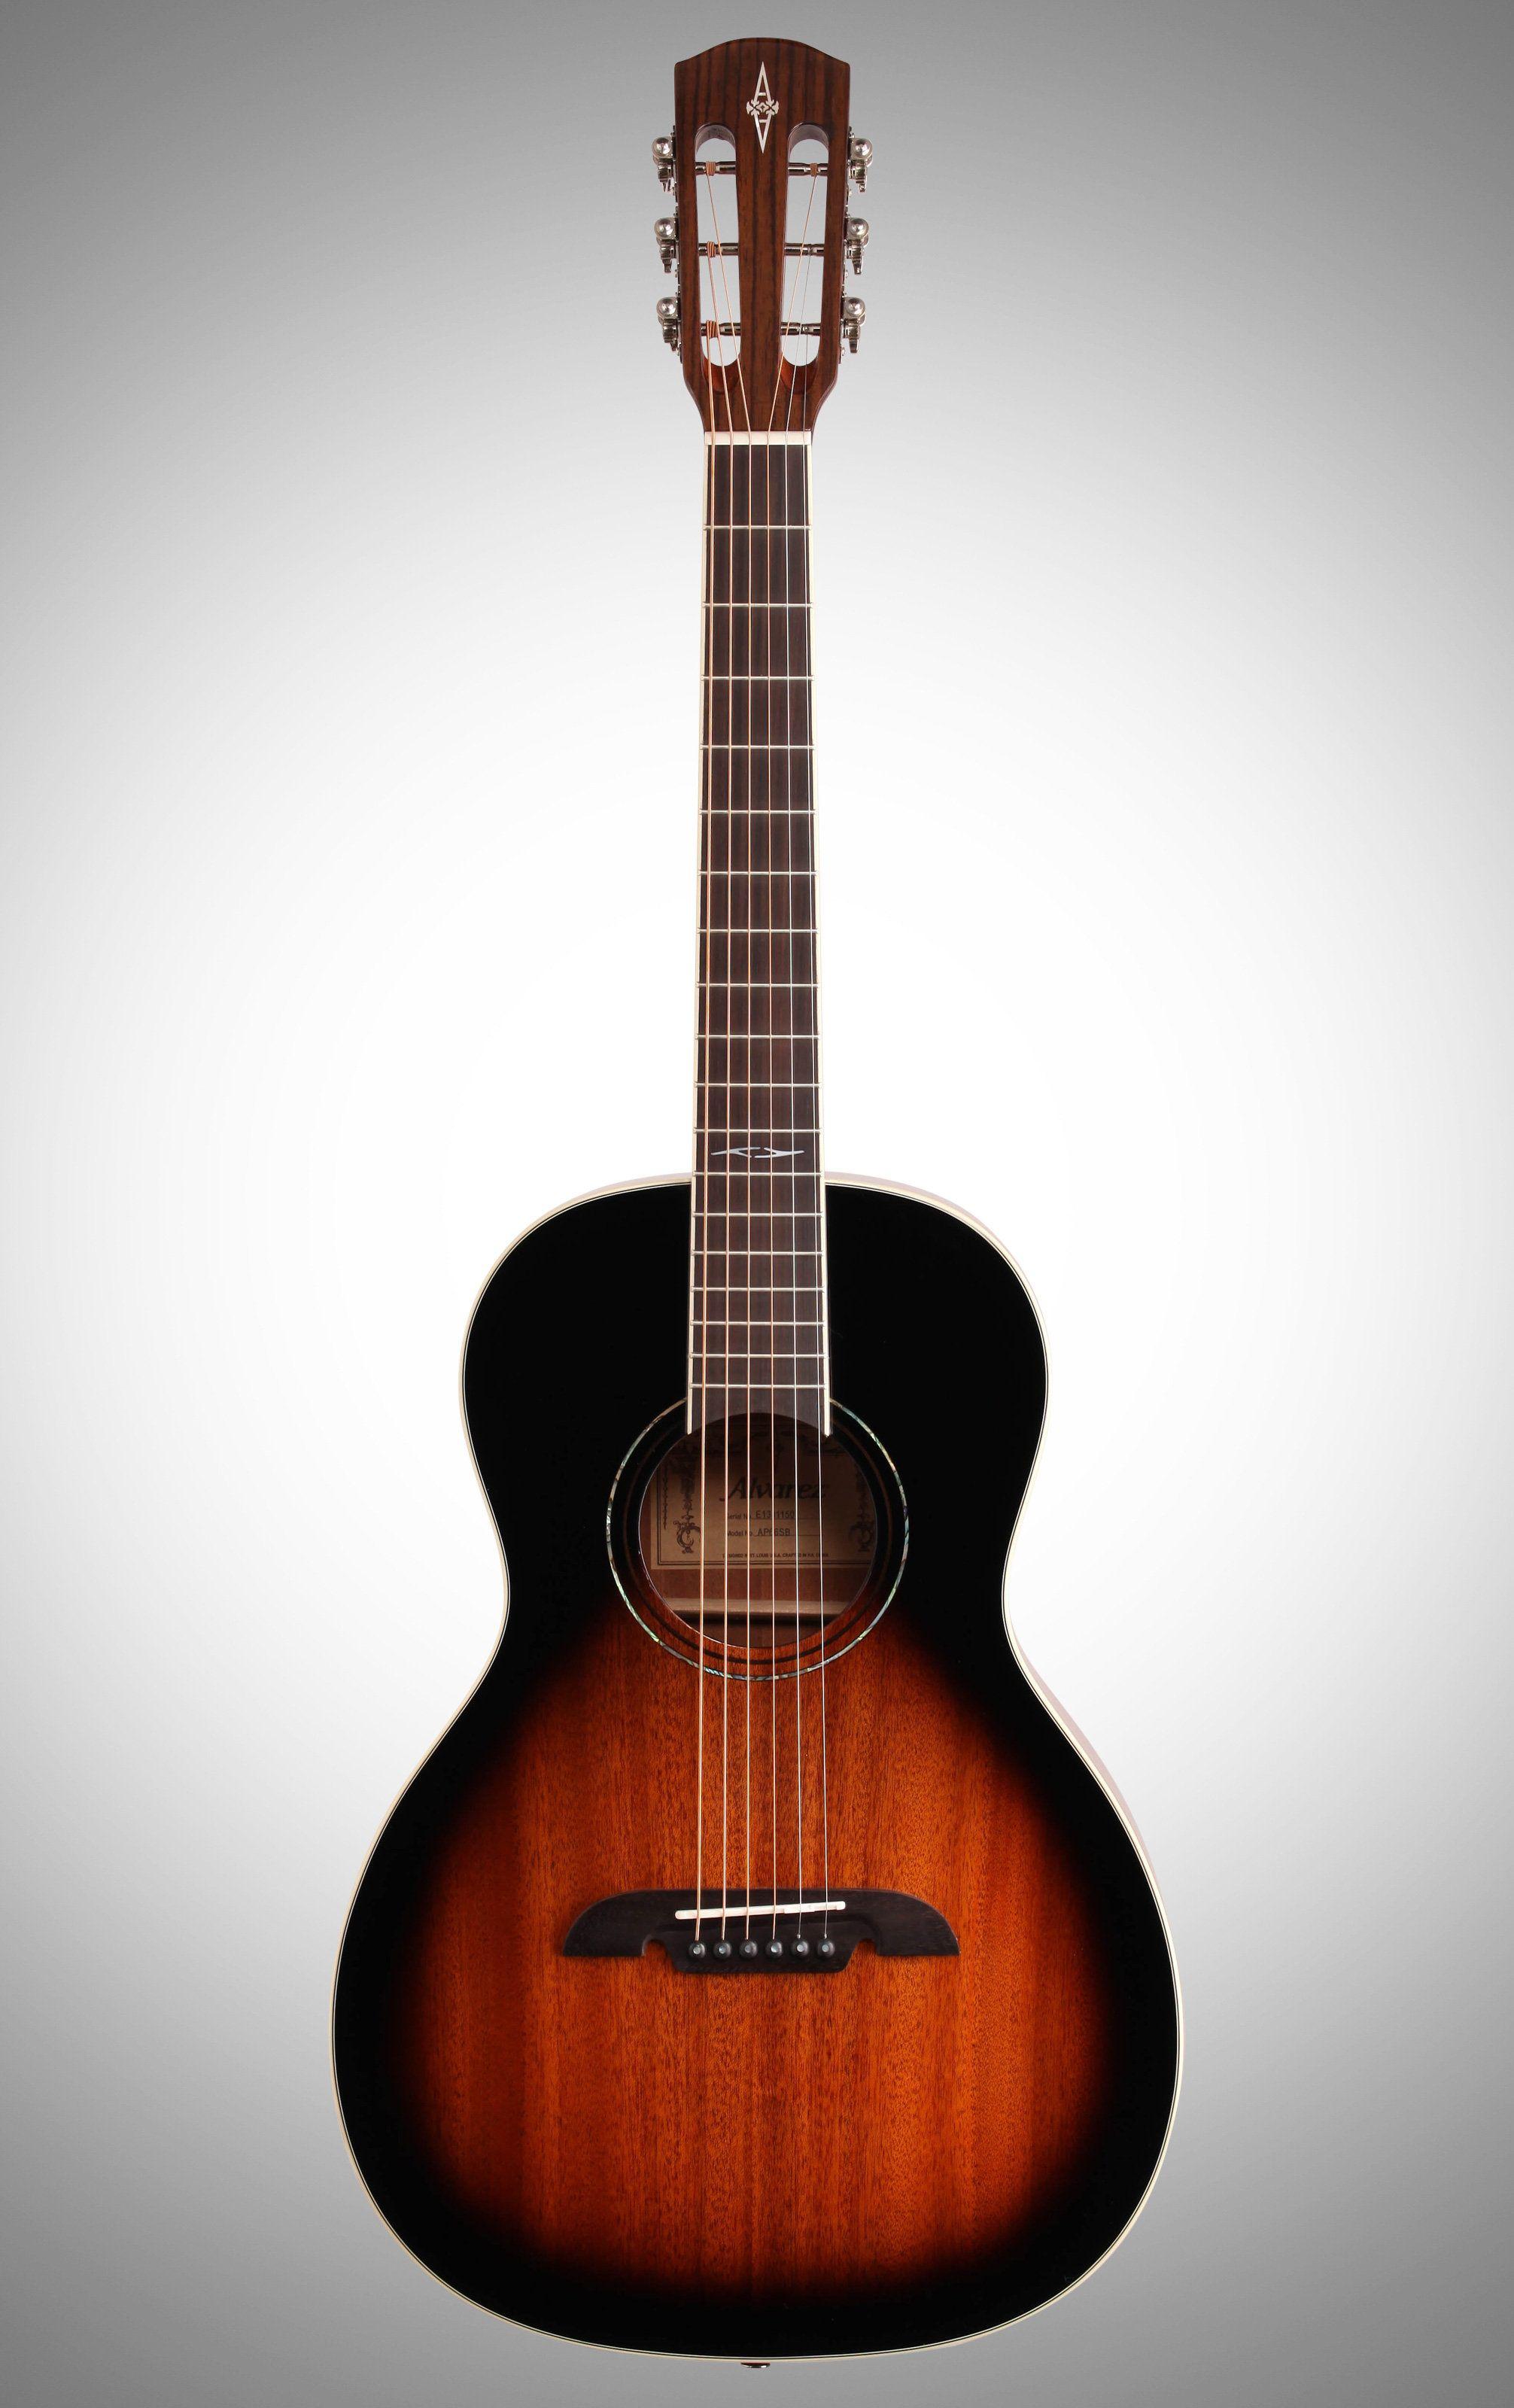 Alvarez Ap66 Parlor Acoustic Guitar Guitar Strumming Acoustic Guitar